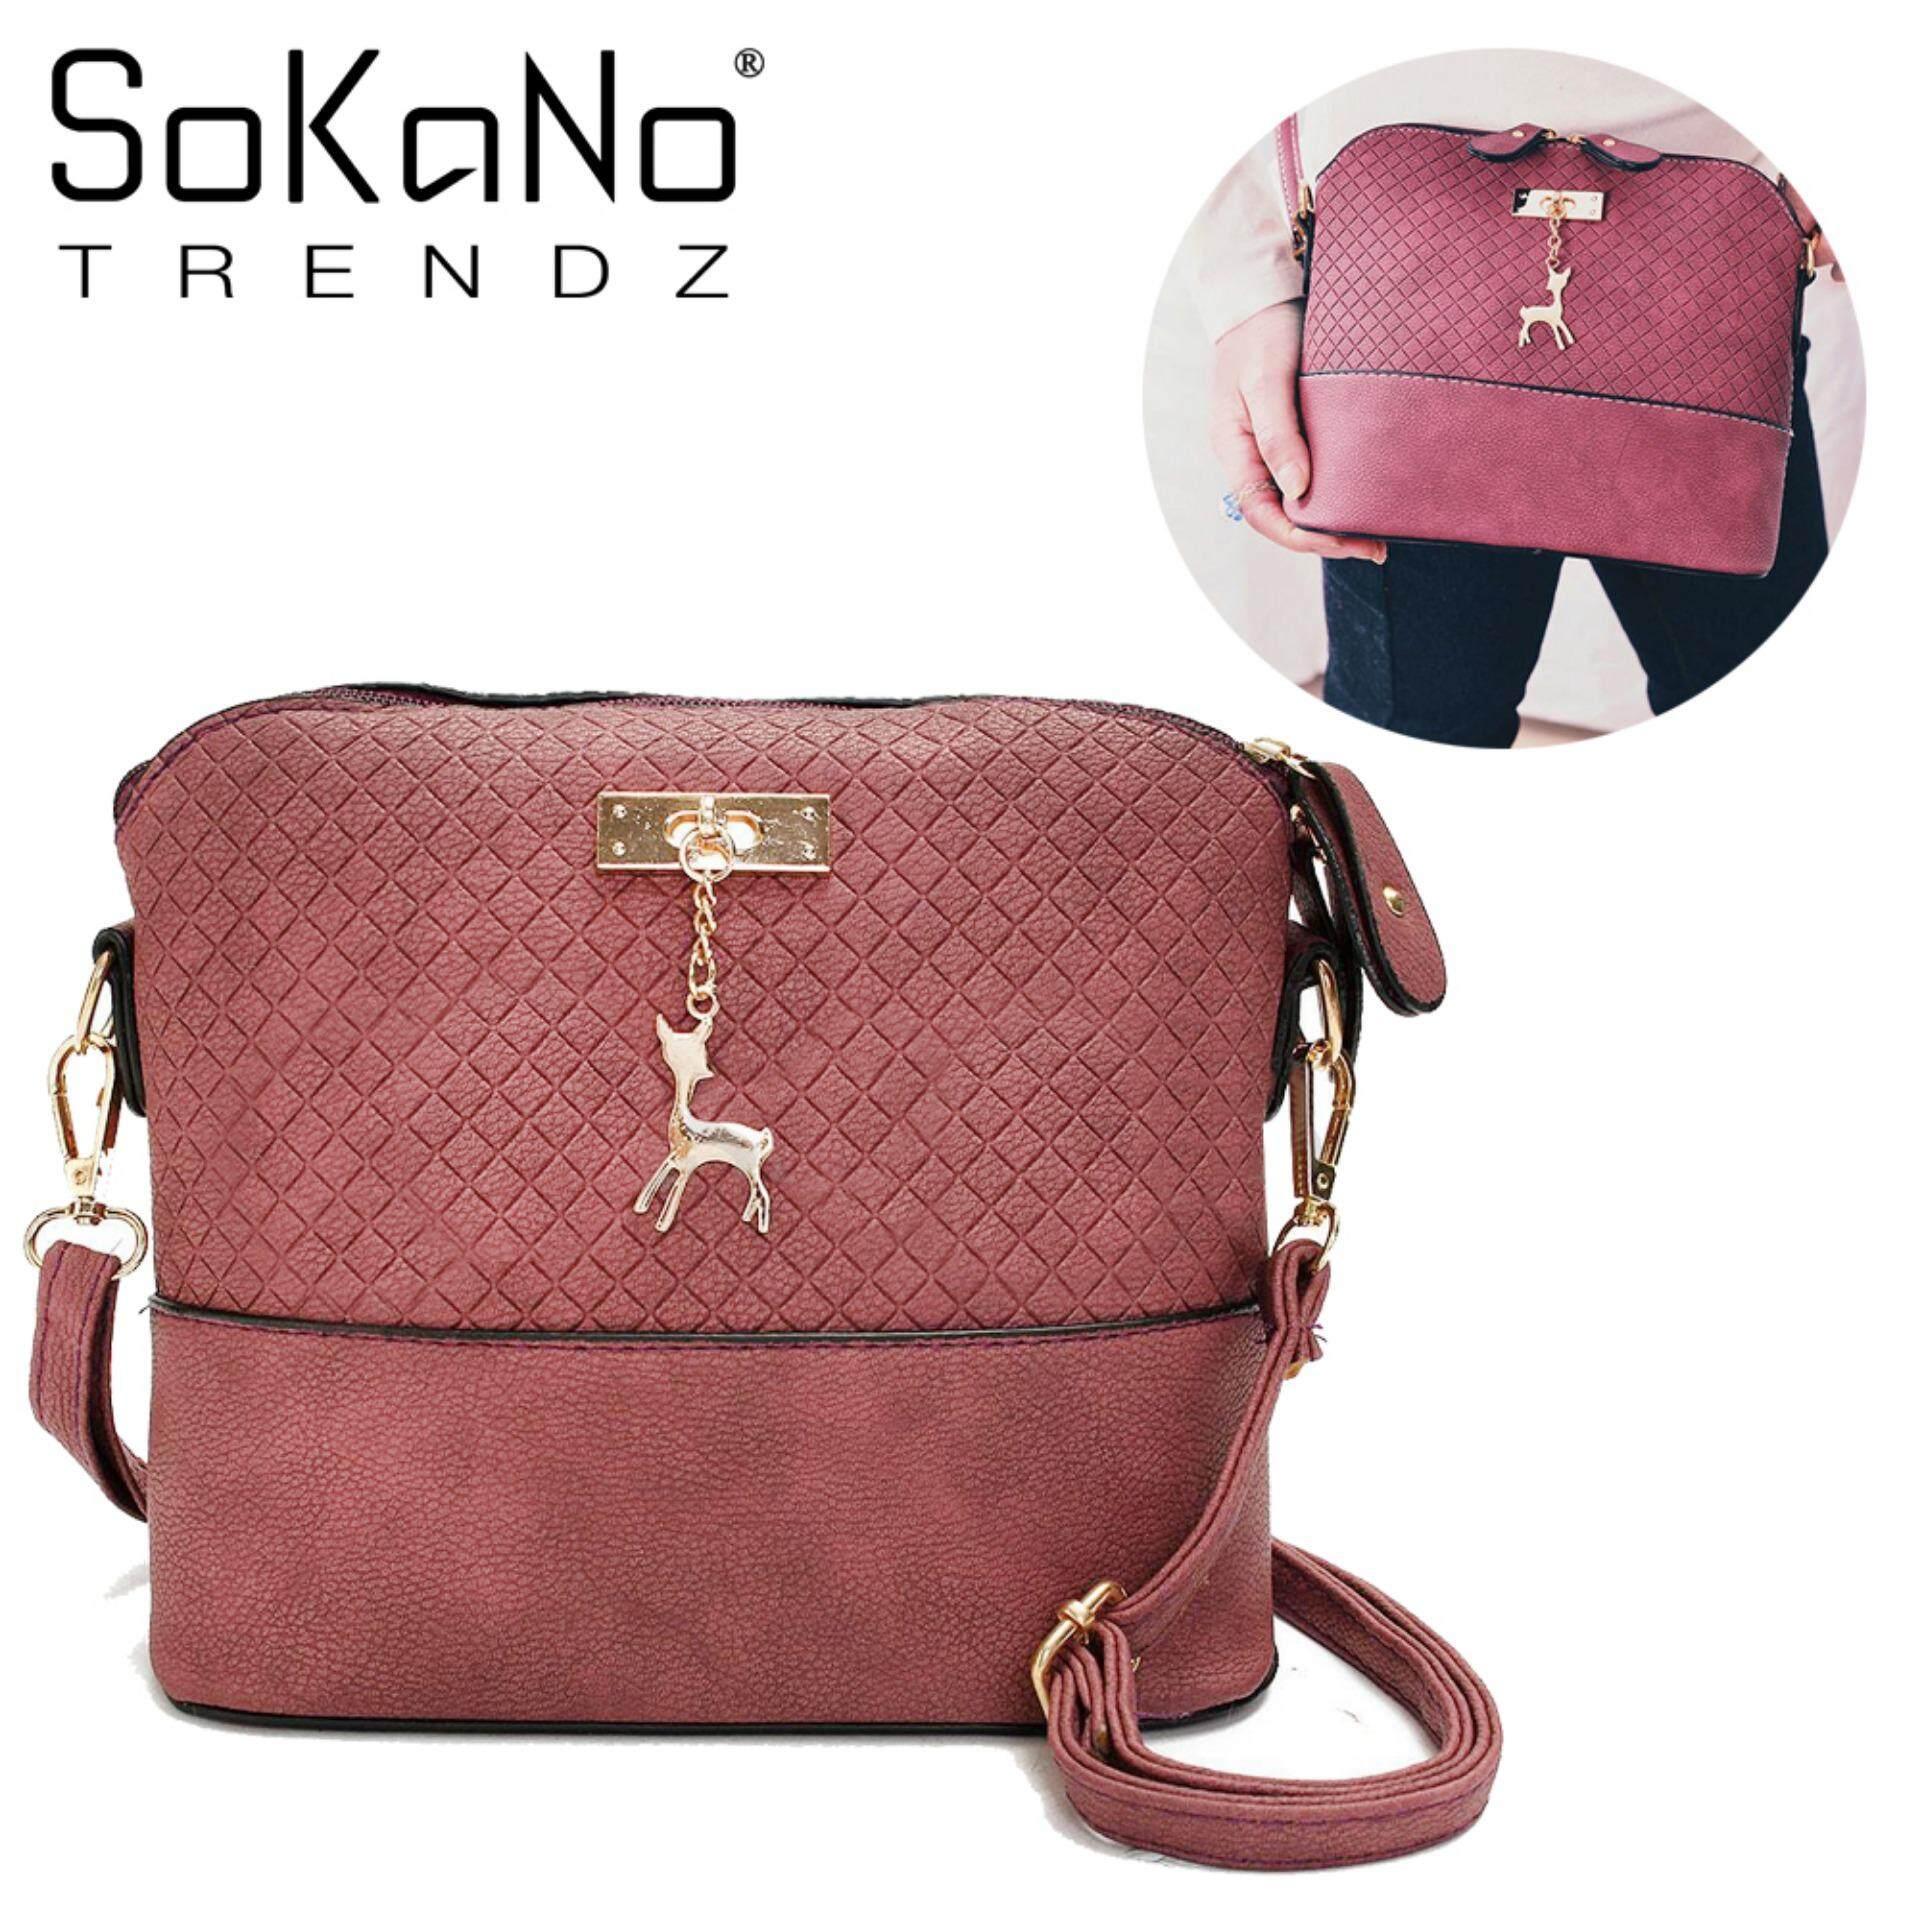 ... Charm Handbeg Wanita - Maroon · Sokano Trendz Skn619 Pu Leather  Crossbody Bag With Deer Char. e134f03d32